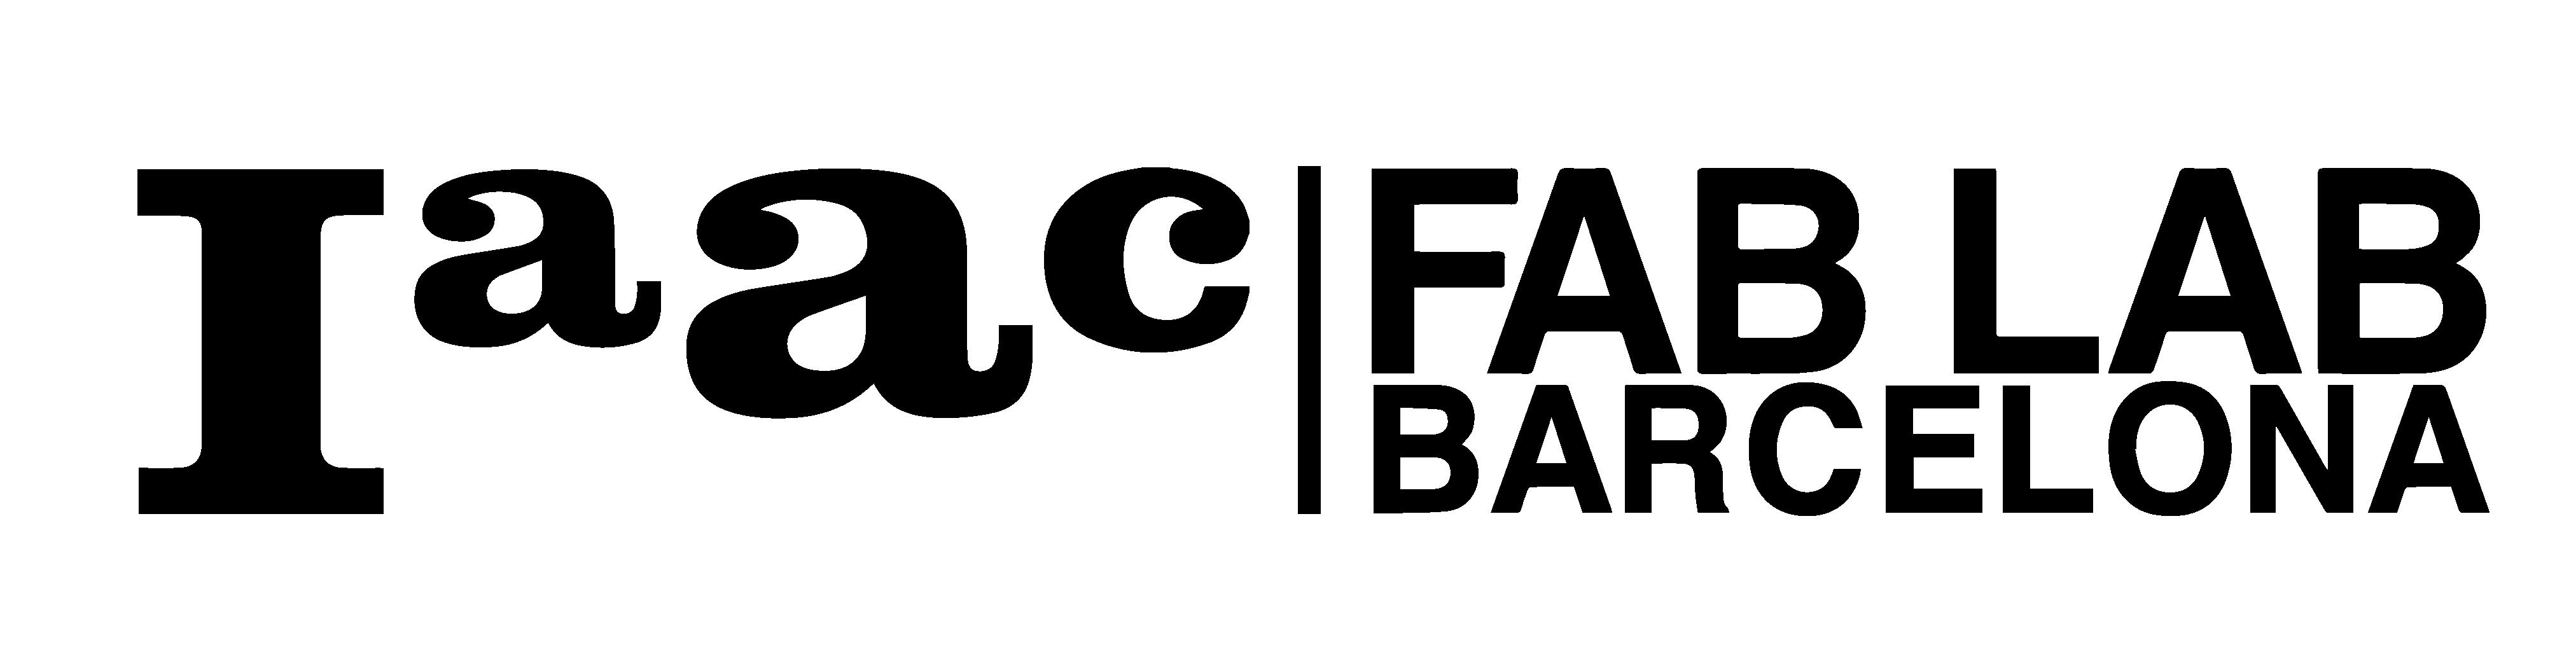 iaac fablabbcn logo2-01